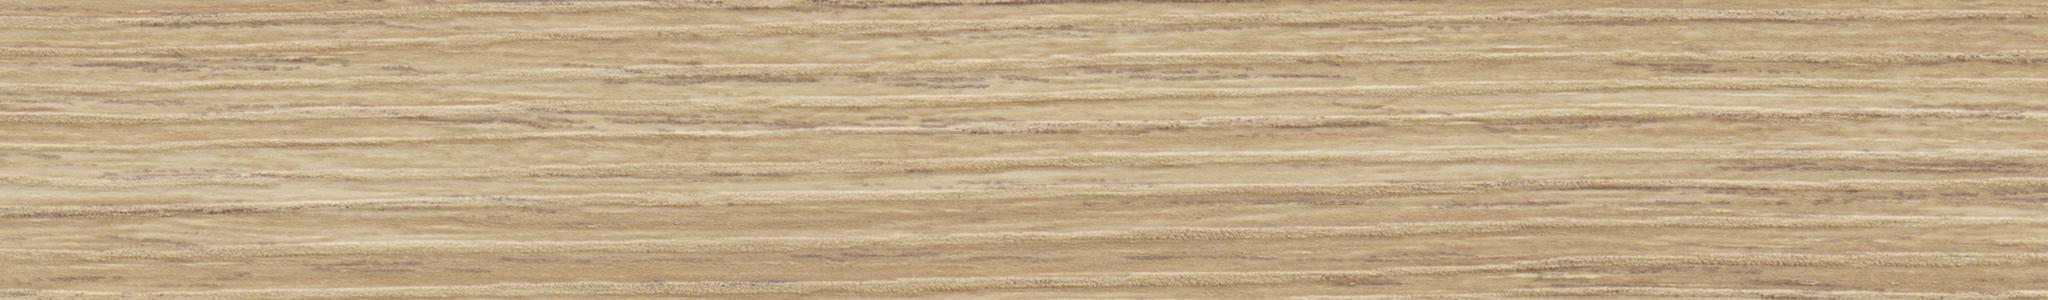 HD 244073 ABS Edge Newport Oak Pore Softmatt